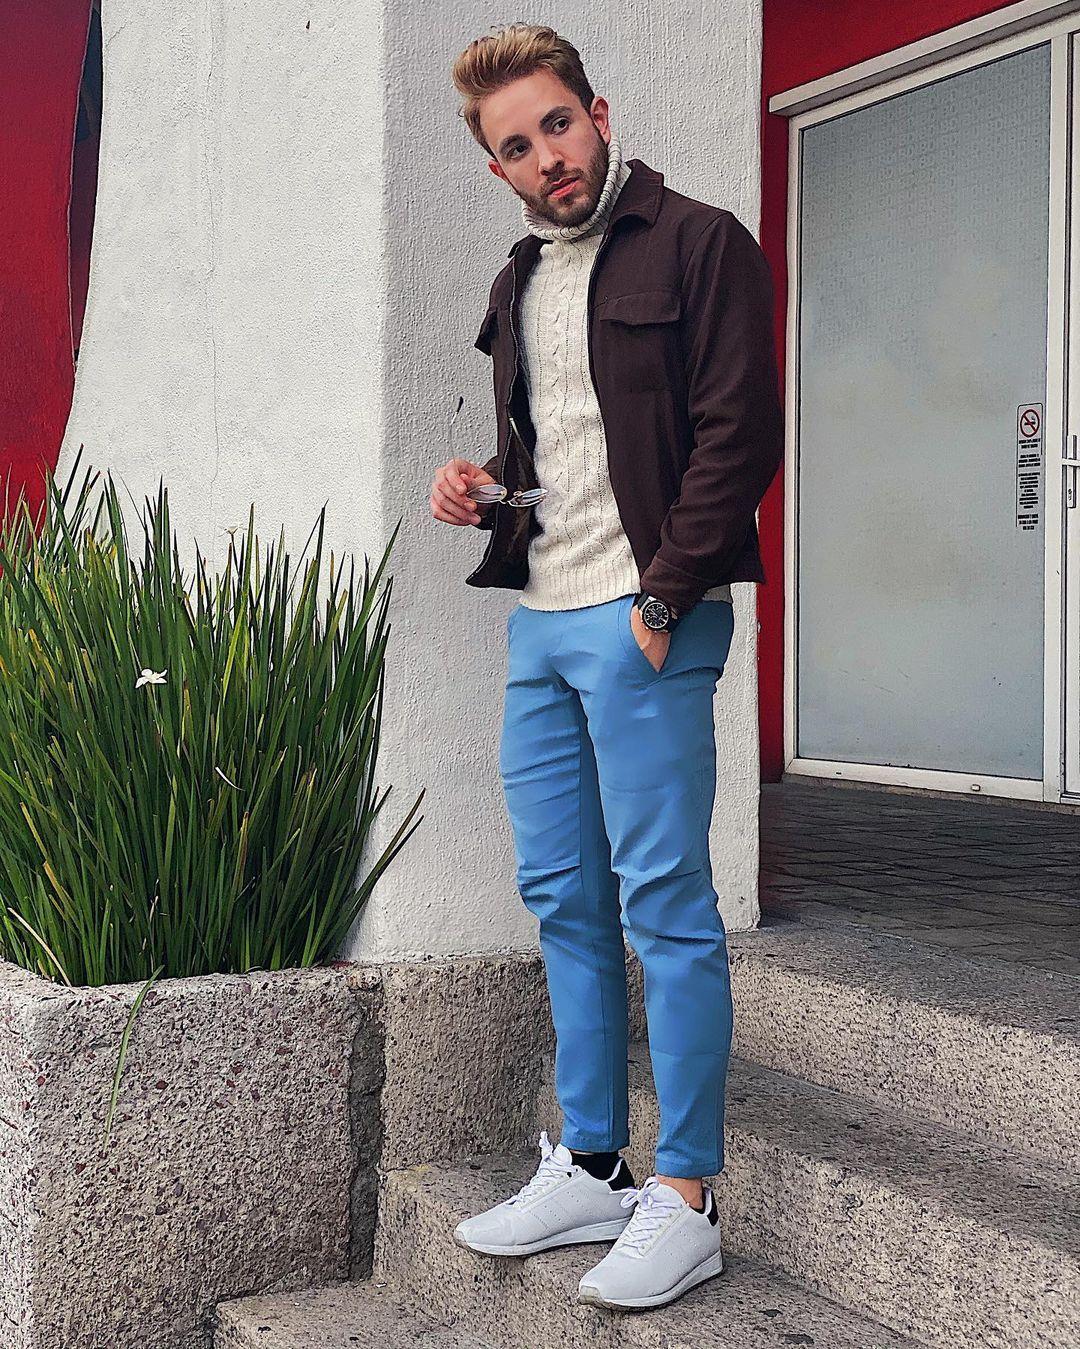 11 9 Mil Me Gusta 54 Comentarios Jose Reynel Jrstylee En Instagram Estos Pantalones Chinos De Esntls Ya Son Mis Mega Favo Fashion Bomber Jacket Style [ 1349 x 1080 Pixel ]